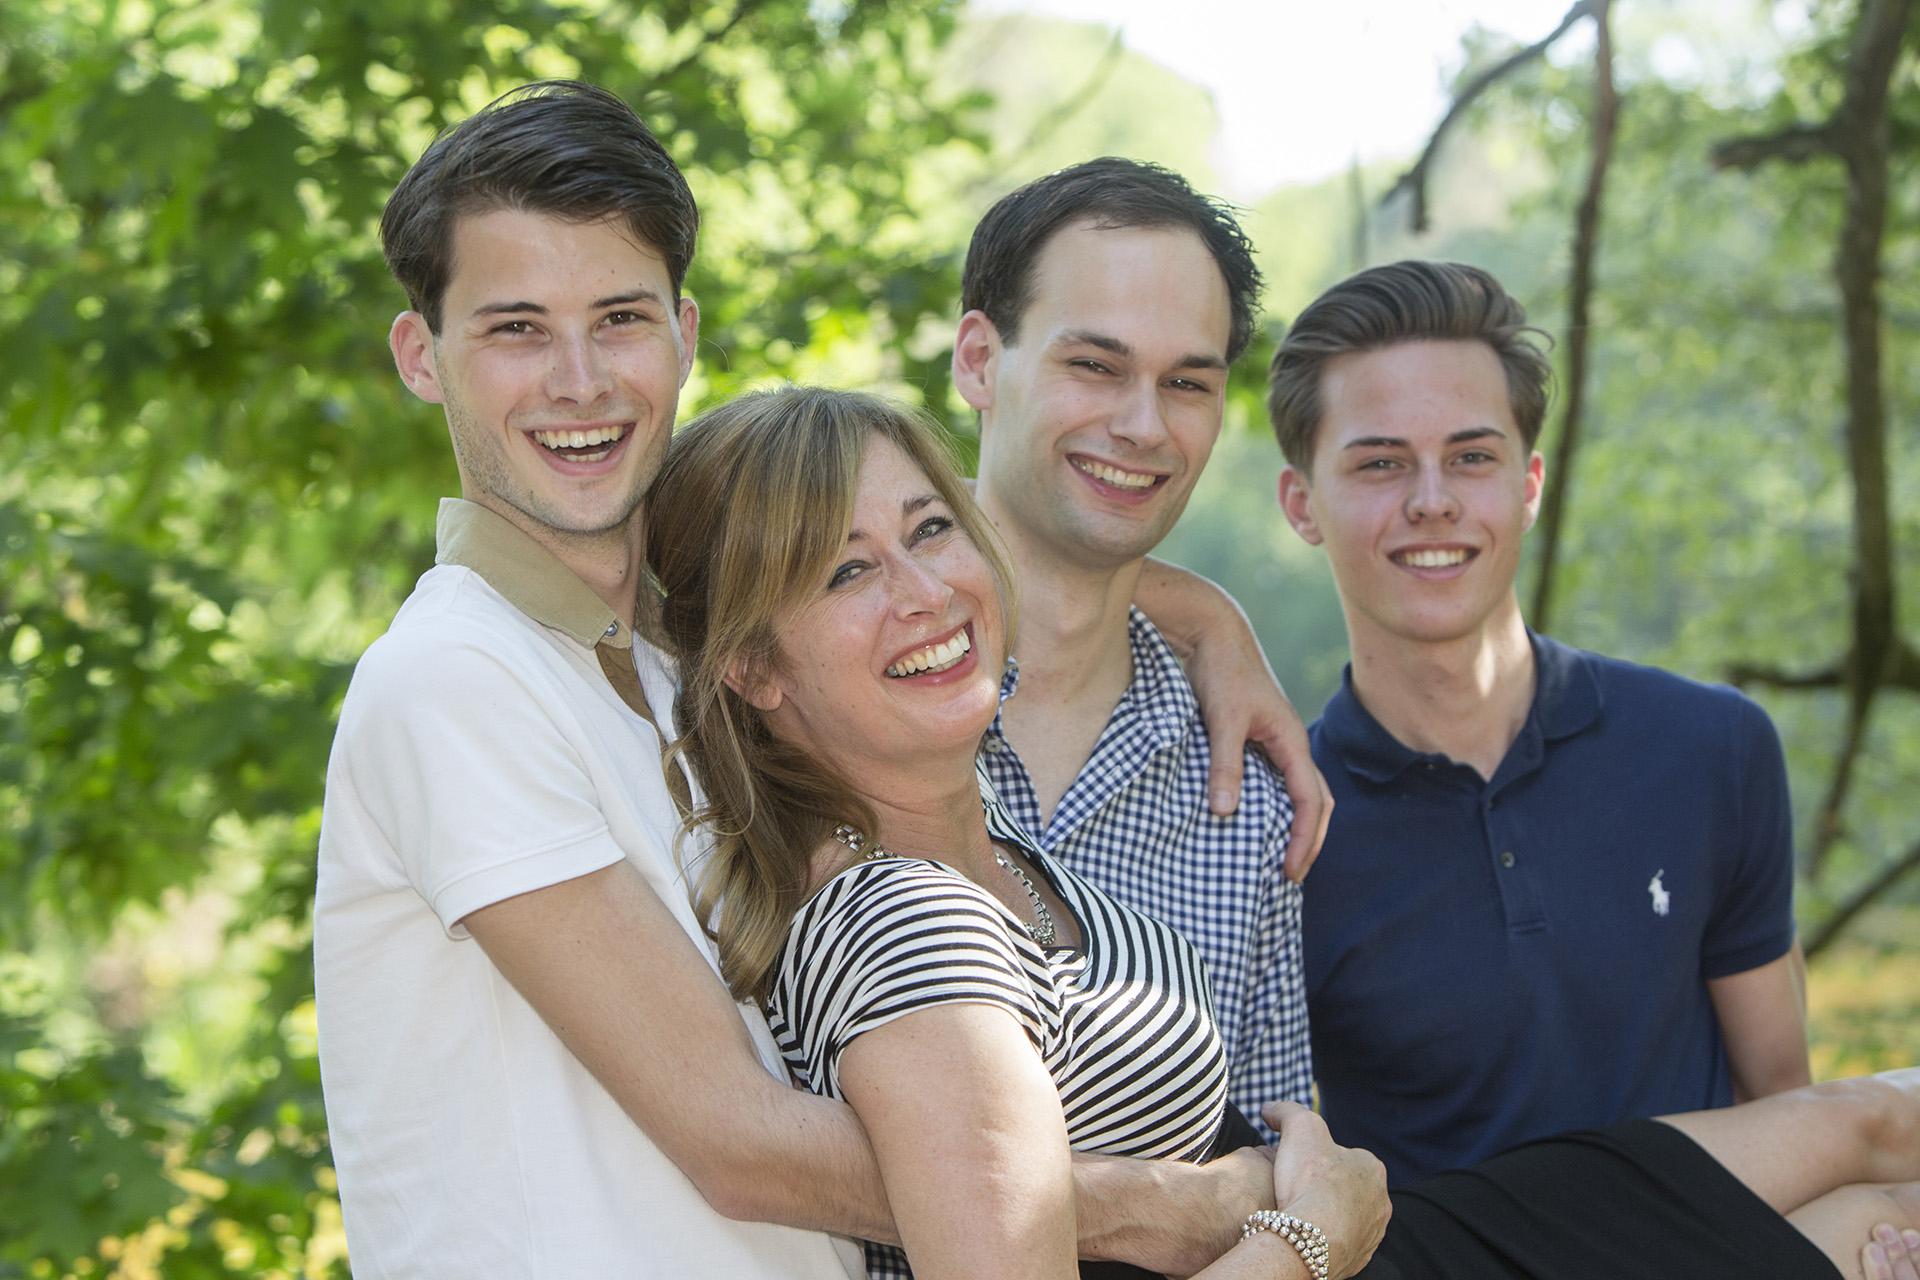 Gezinsfotografie, Familiefotografie